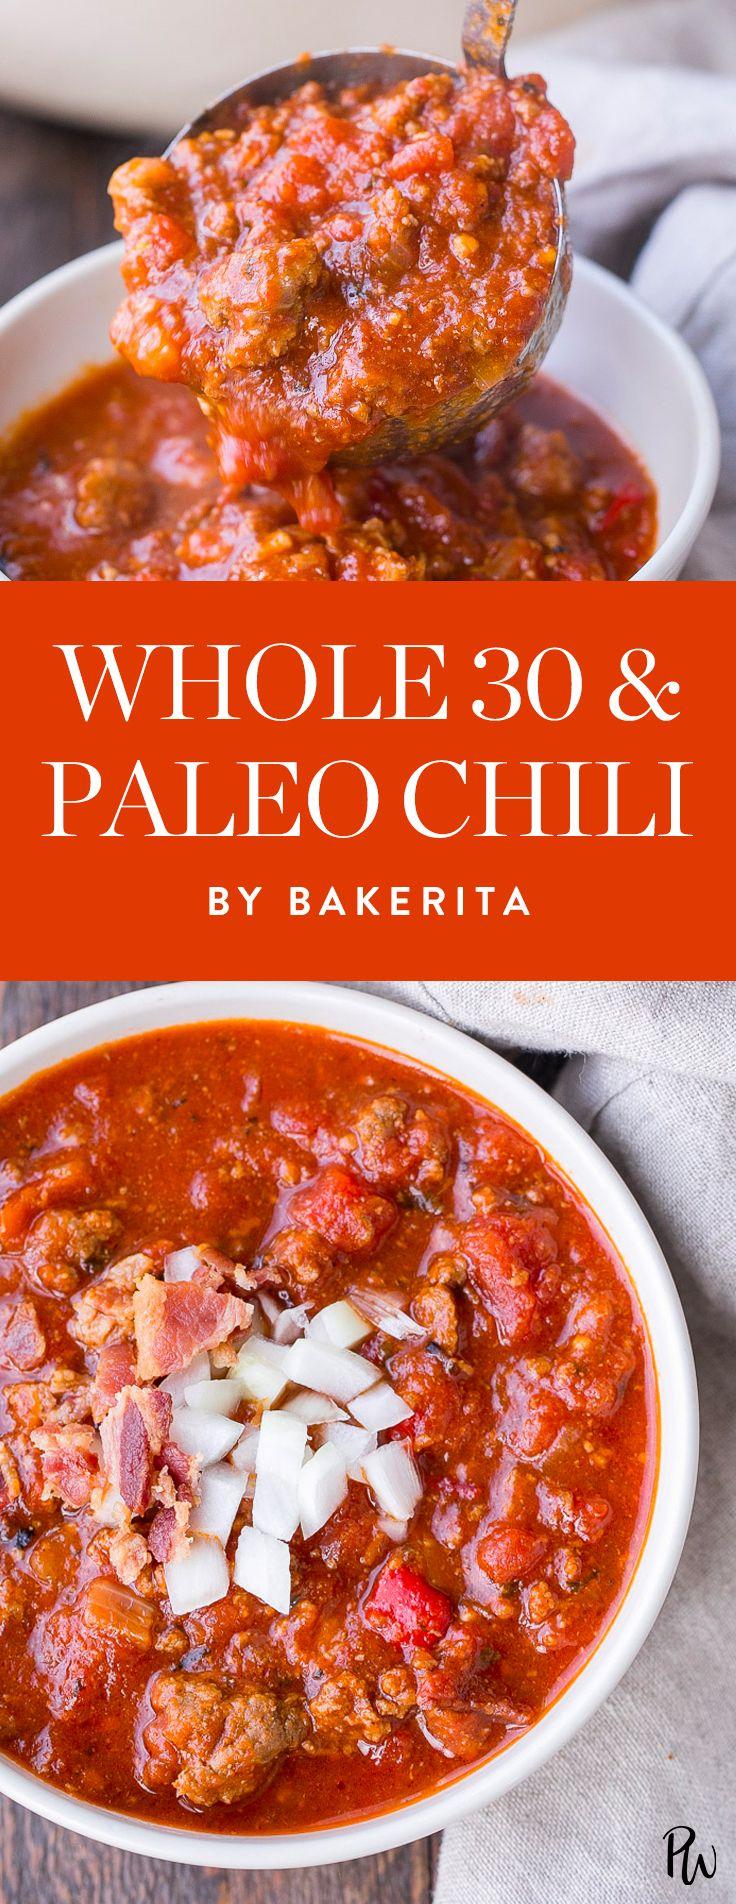 15 Whole30 Soup Recipes to Warm You Up All Season